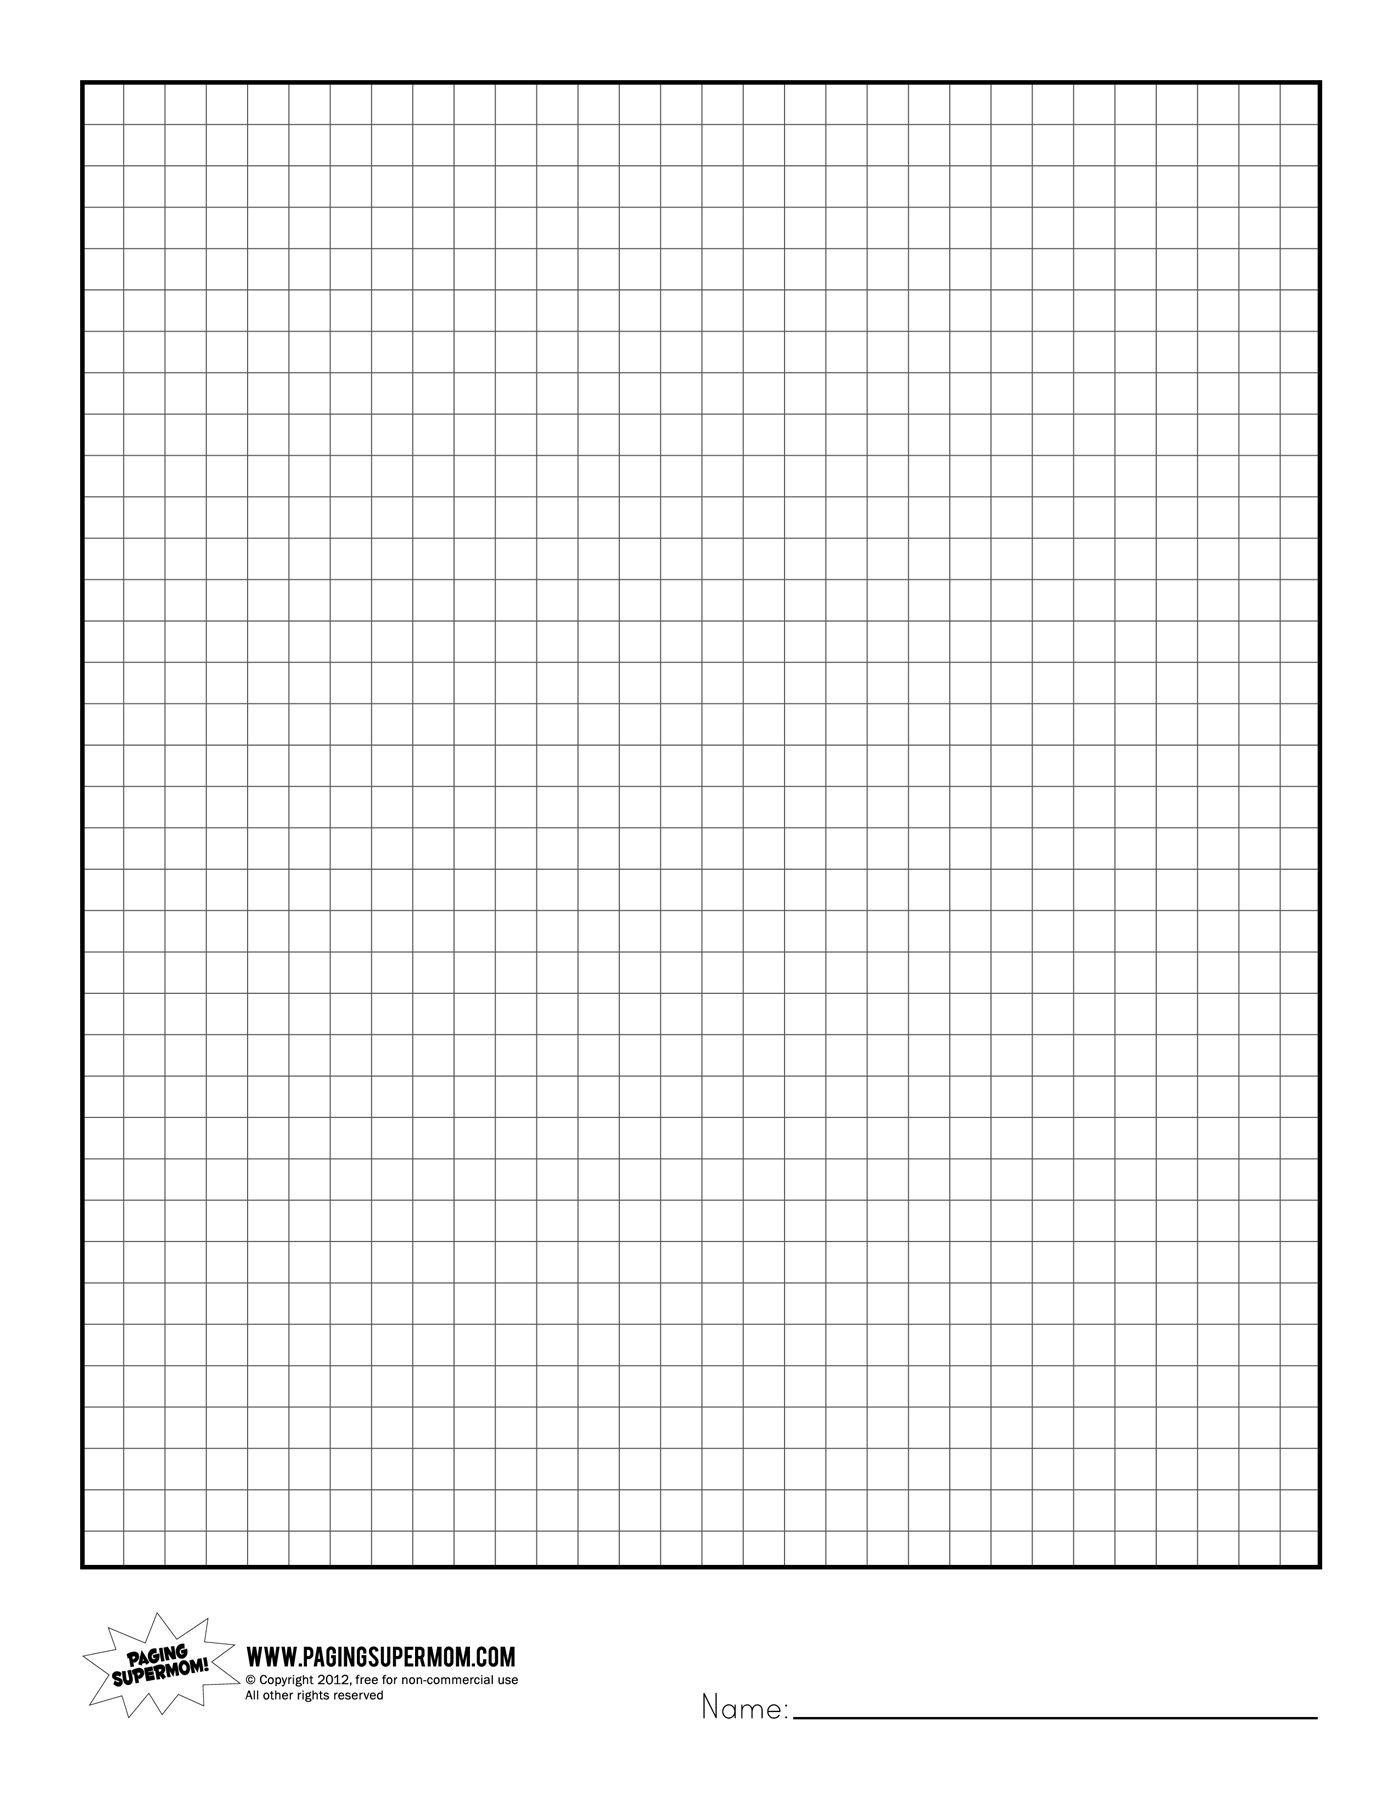 Printable Graph Paper | Healthy Eating | Grid Paper Printable - Free Printable Graph Paper 1 4 Inch